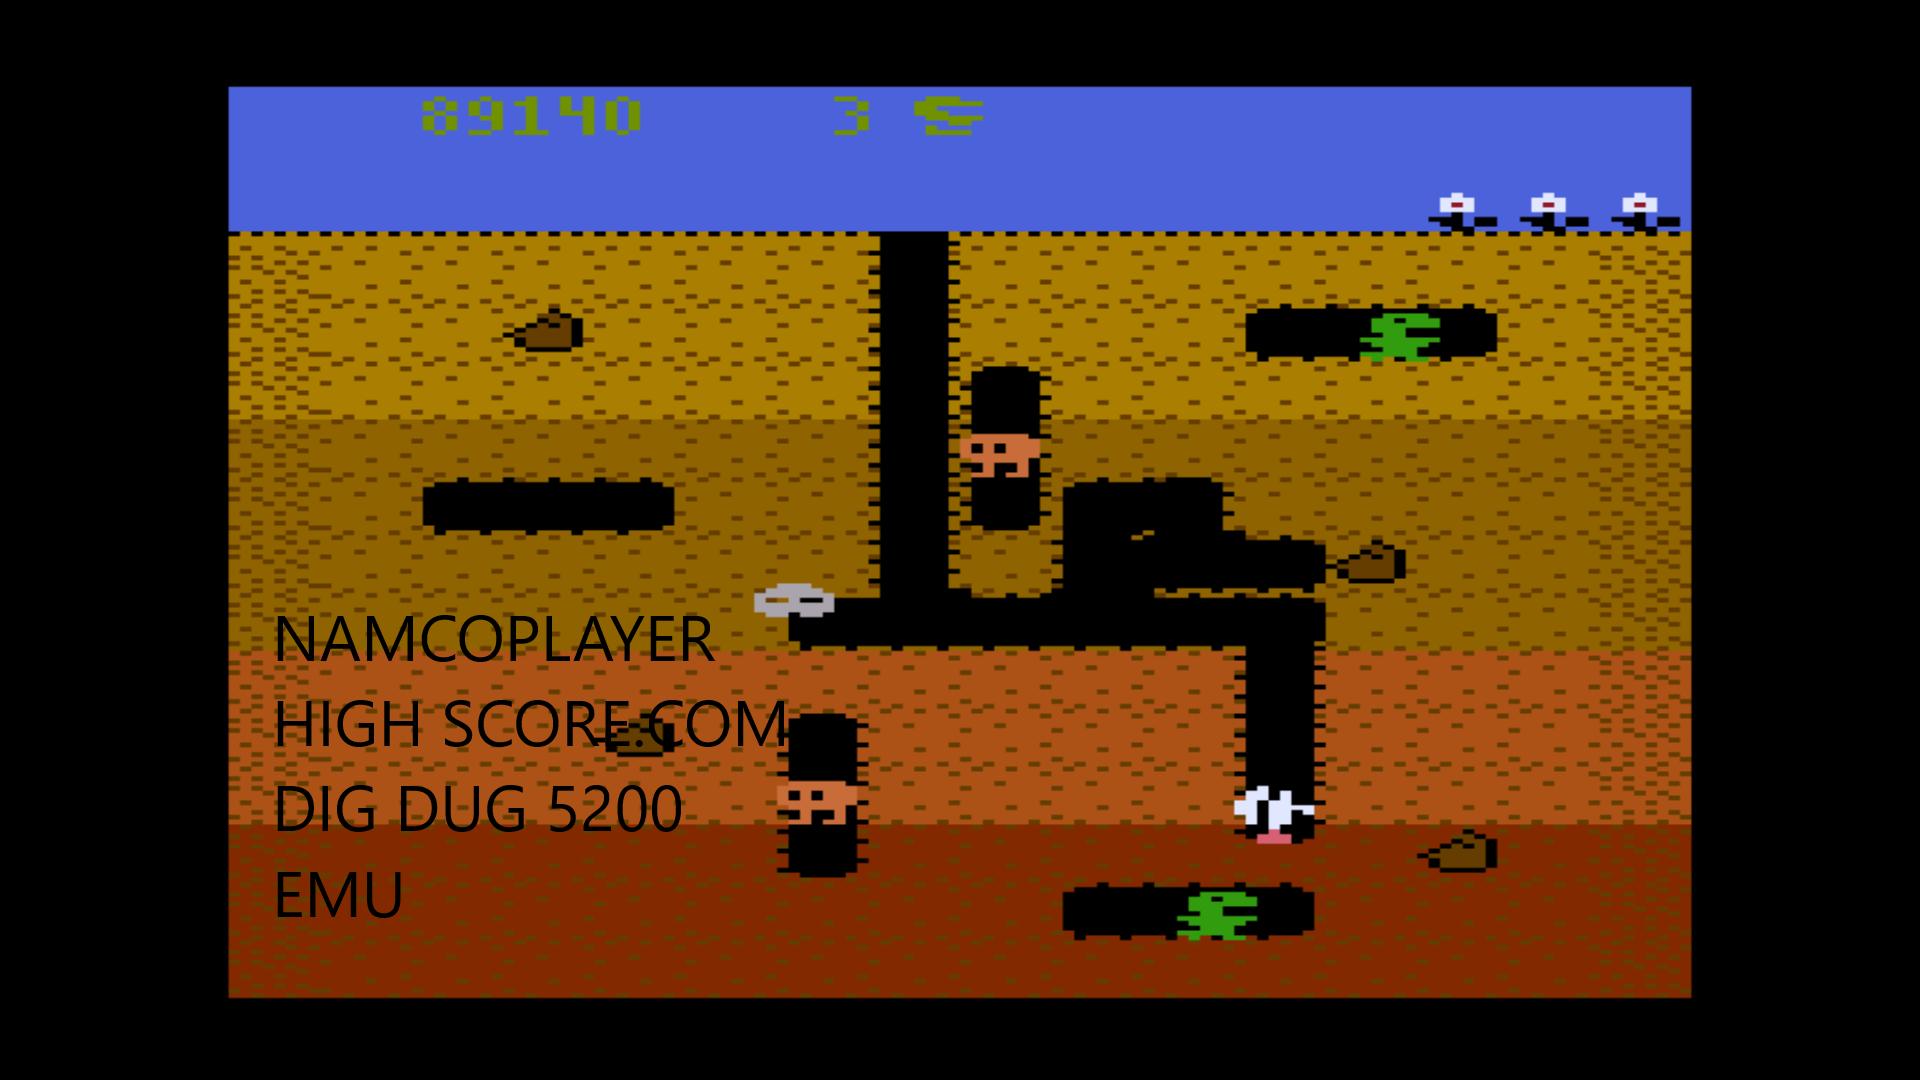 NamcoPlayer: Dig Dug: Carrot Start (Atari 5200 Emulated) 89,140 points on 2020-10-30 17:07:23